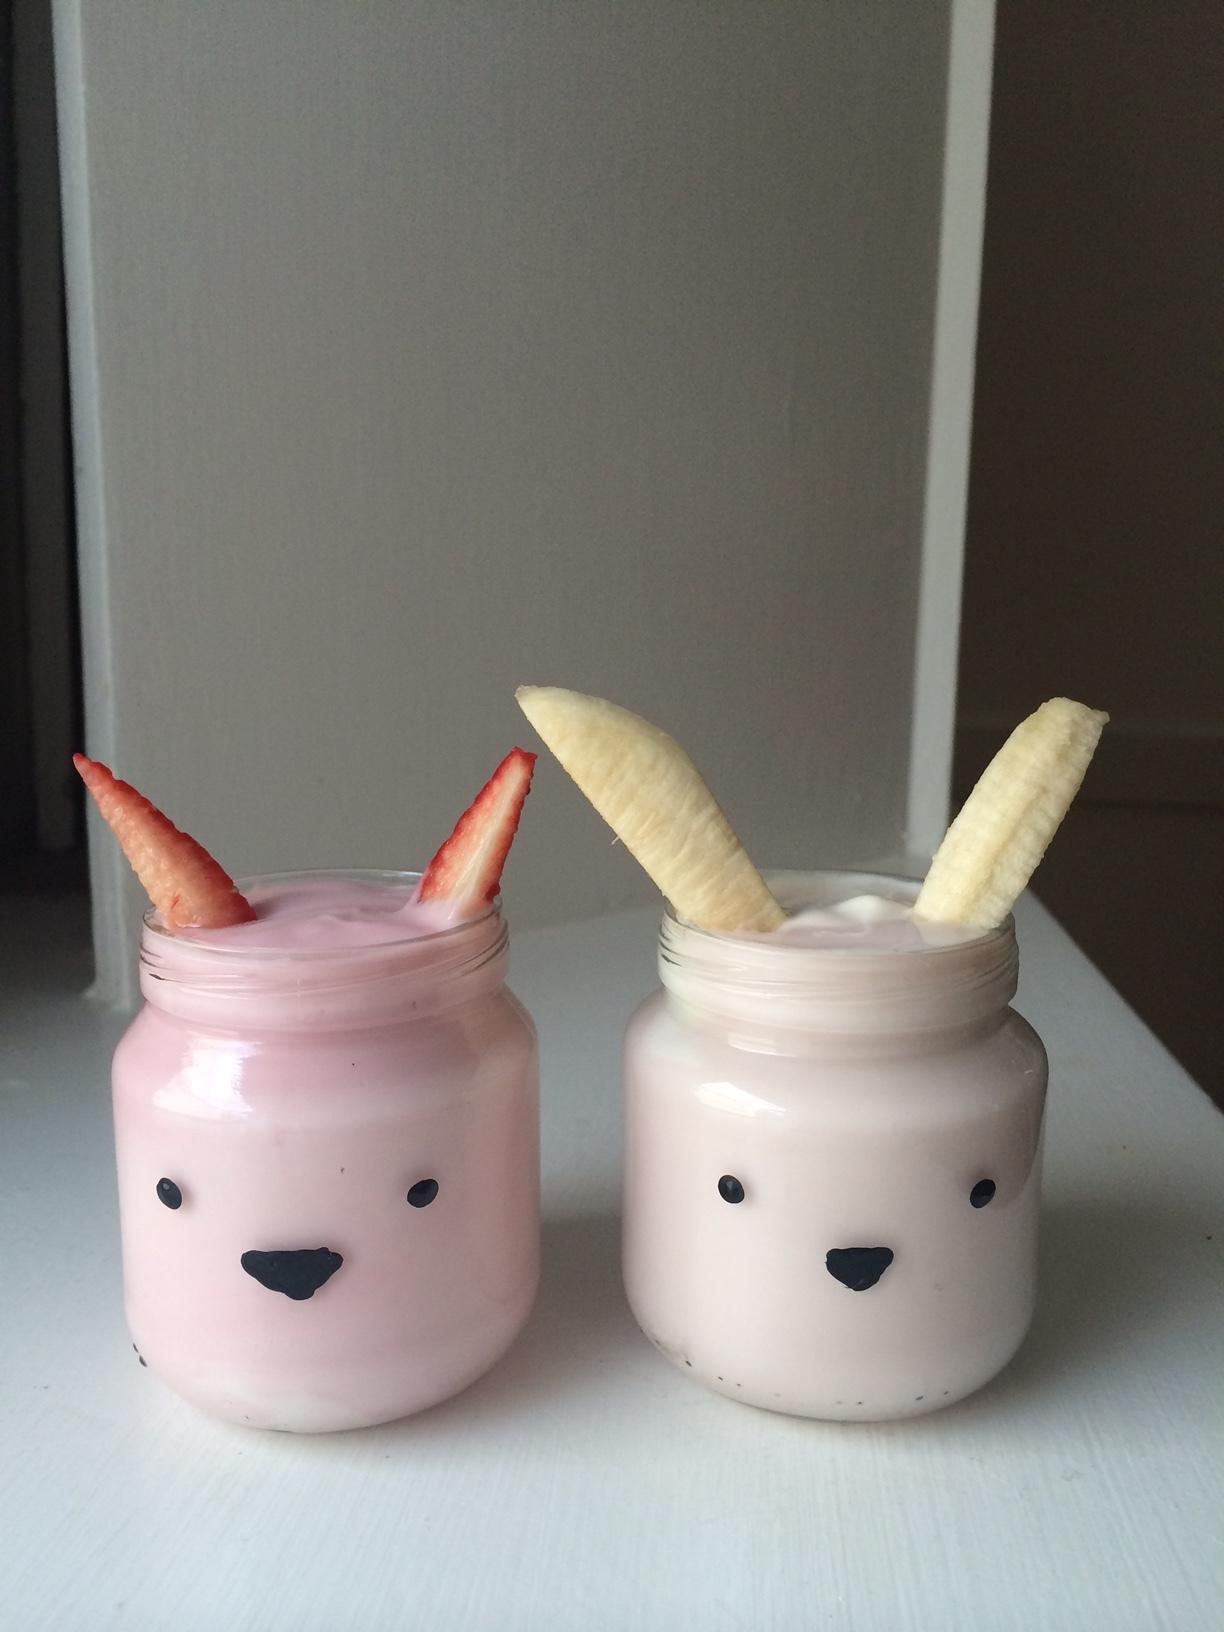 Yogurt-Bunny-1-Super-Make-Iy